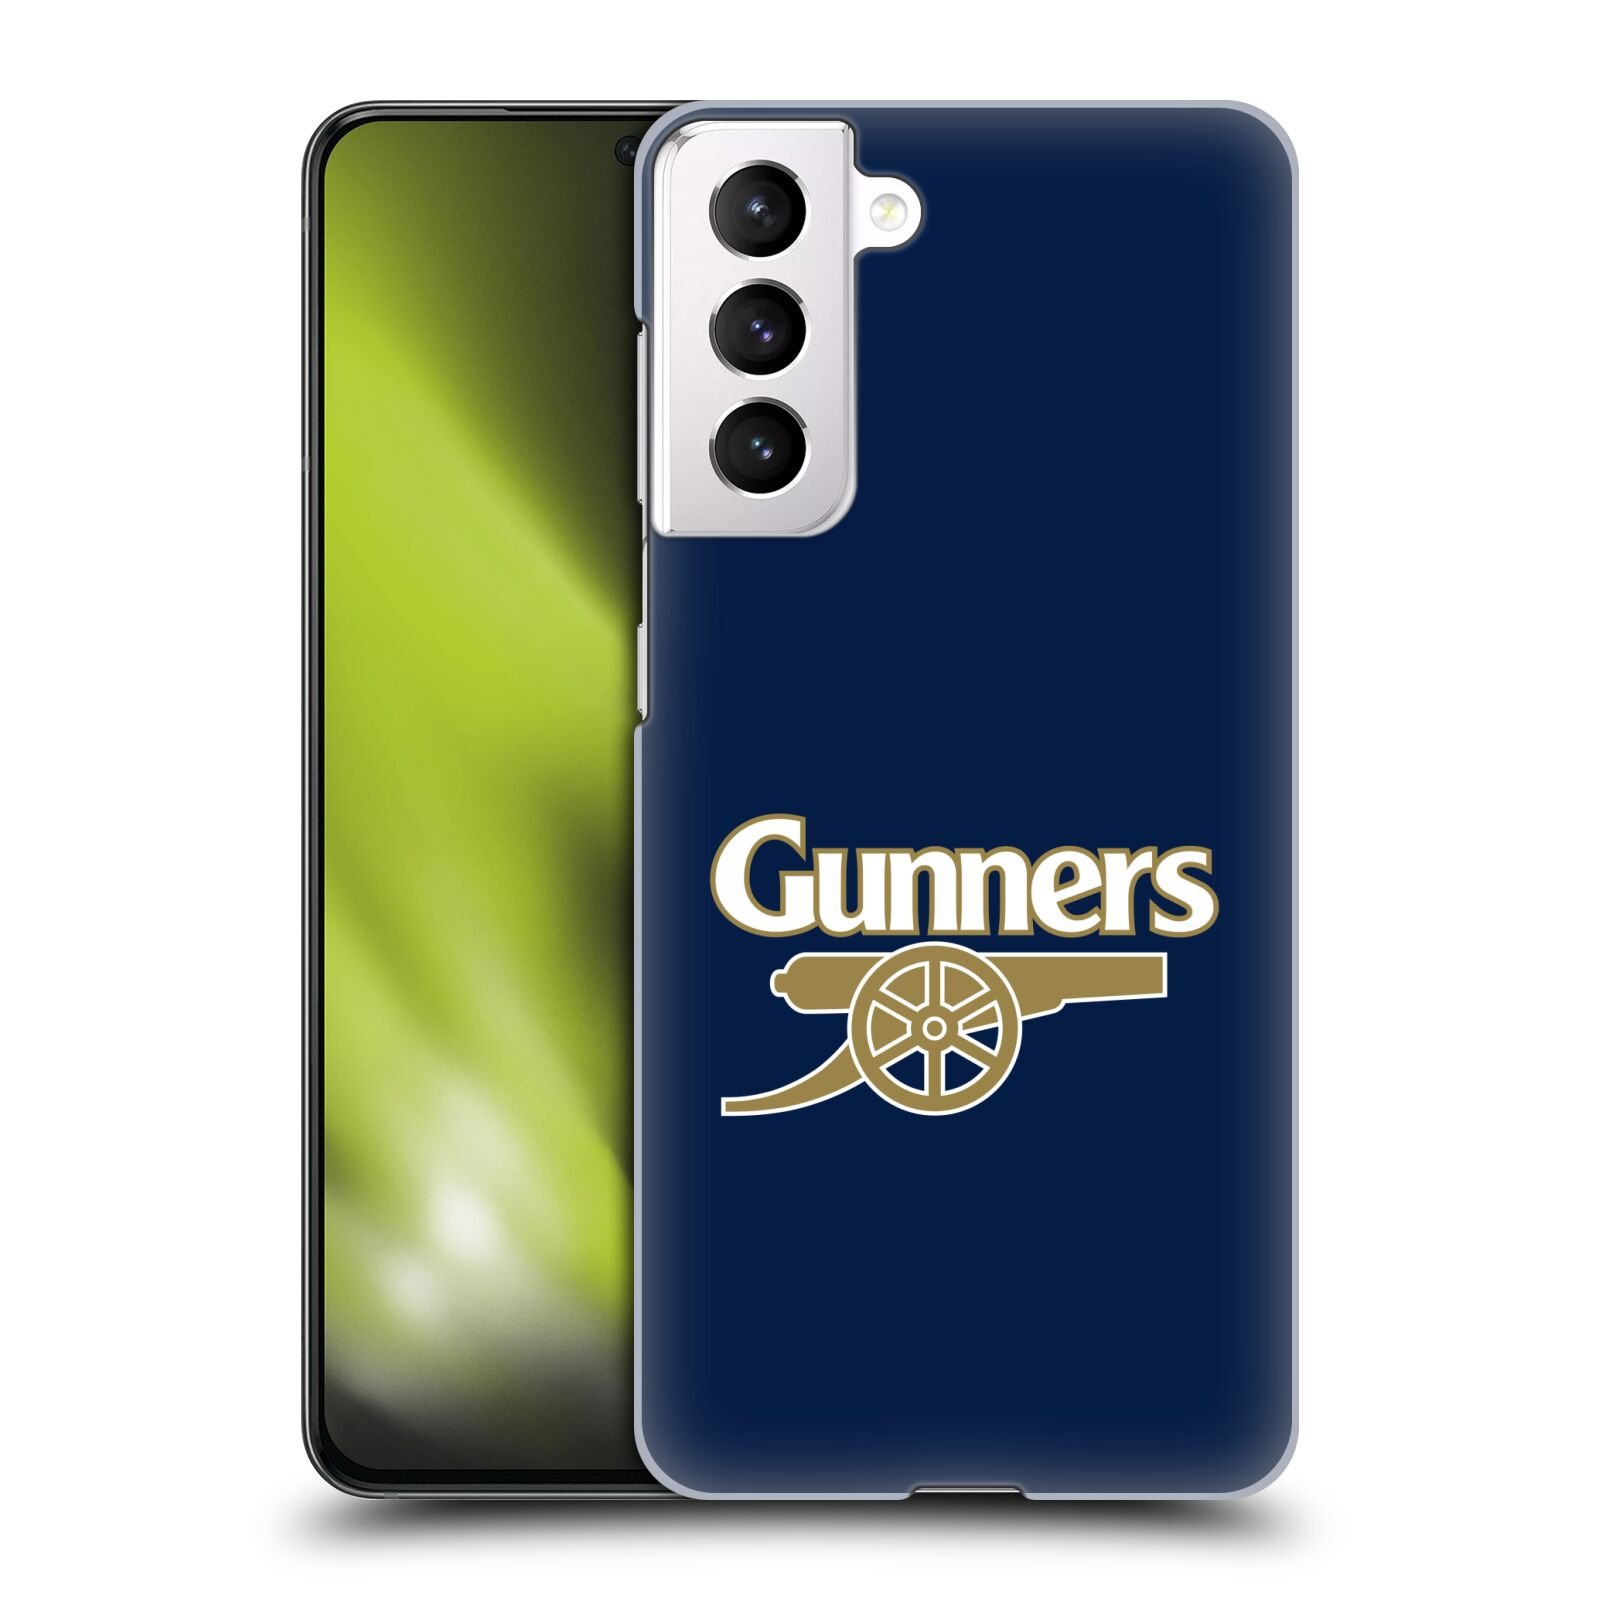 Plastové pouzdro na mobil Samsung Galaxy S21 5G - Head Case - Arsenal FC - Gunners